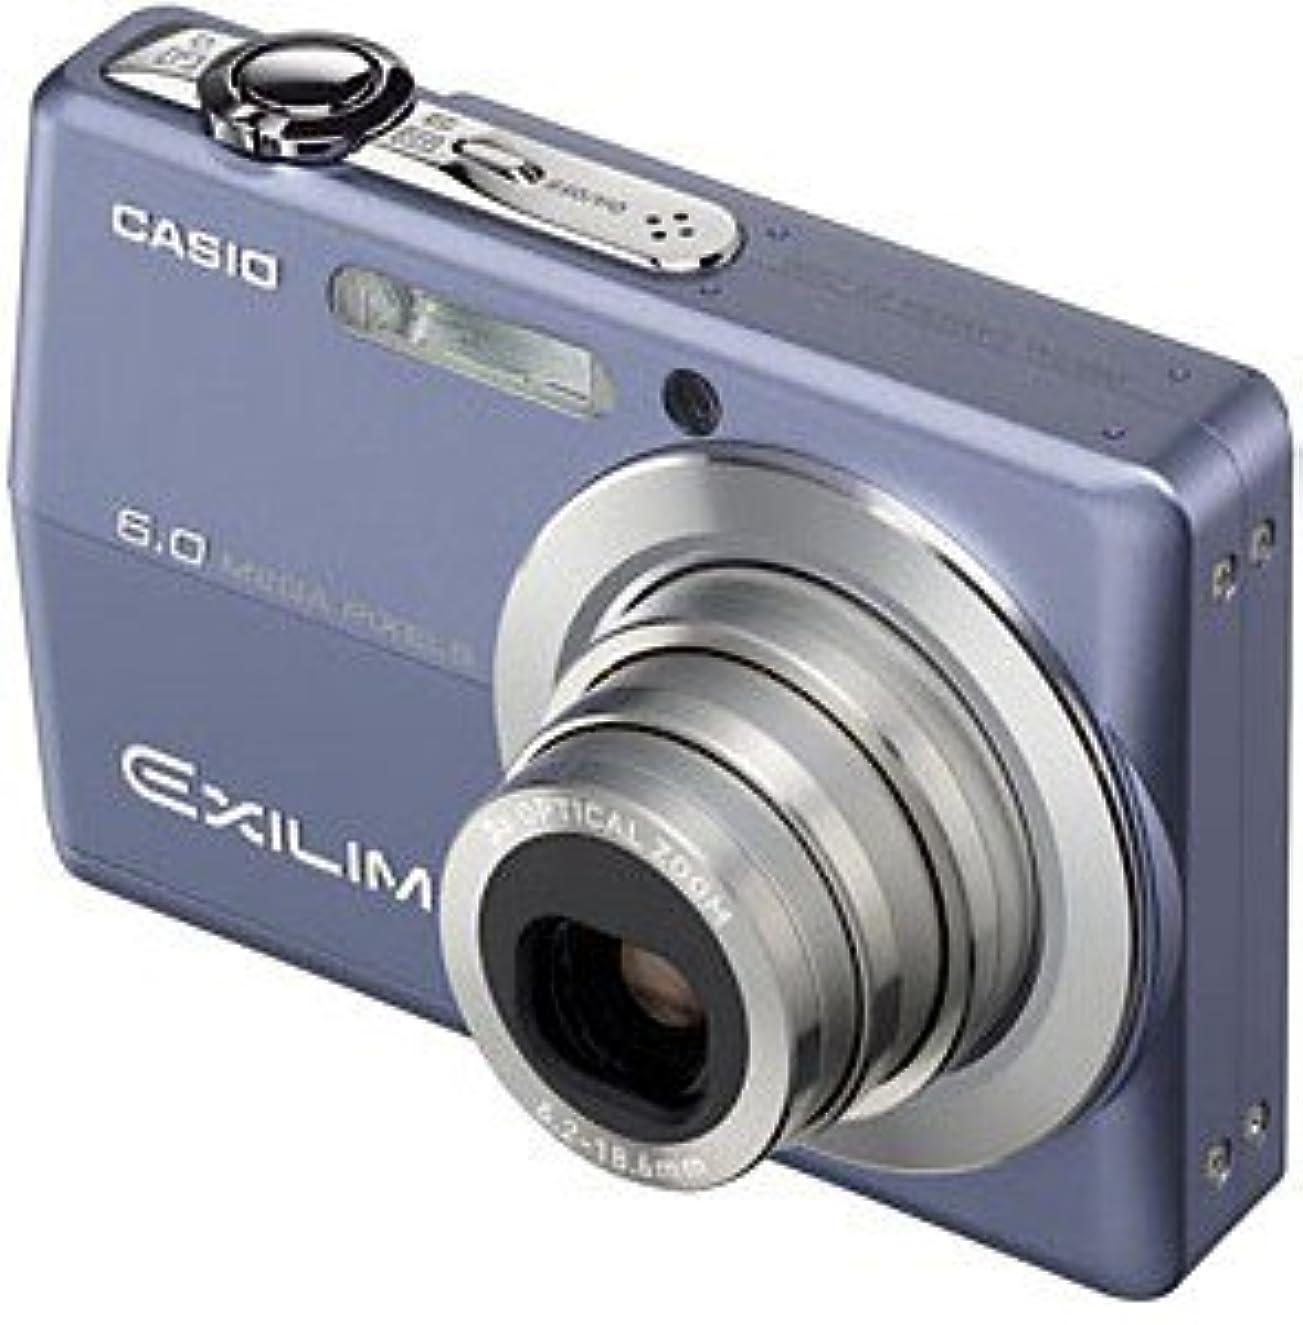 Casio EXILIM ZOOM EX-Z600 6.0 MP Digital Camera with color display - Silver